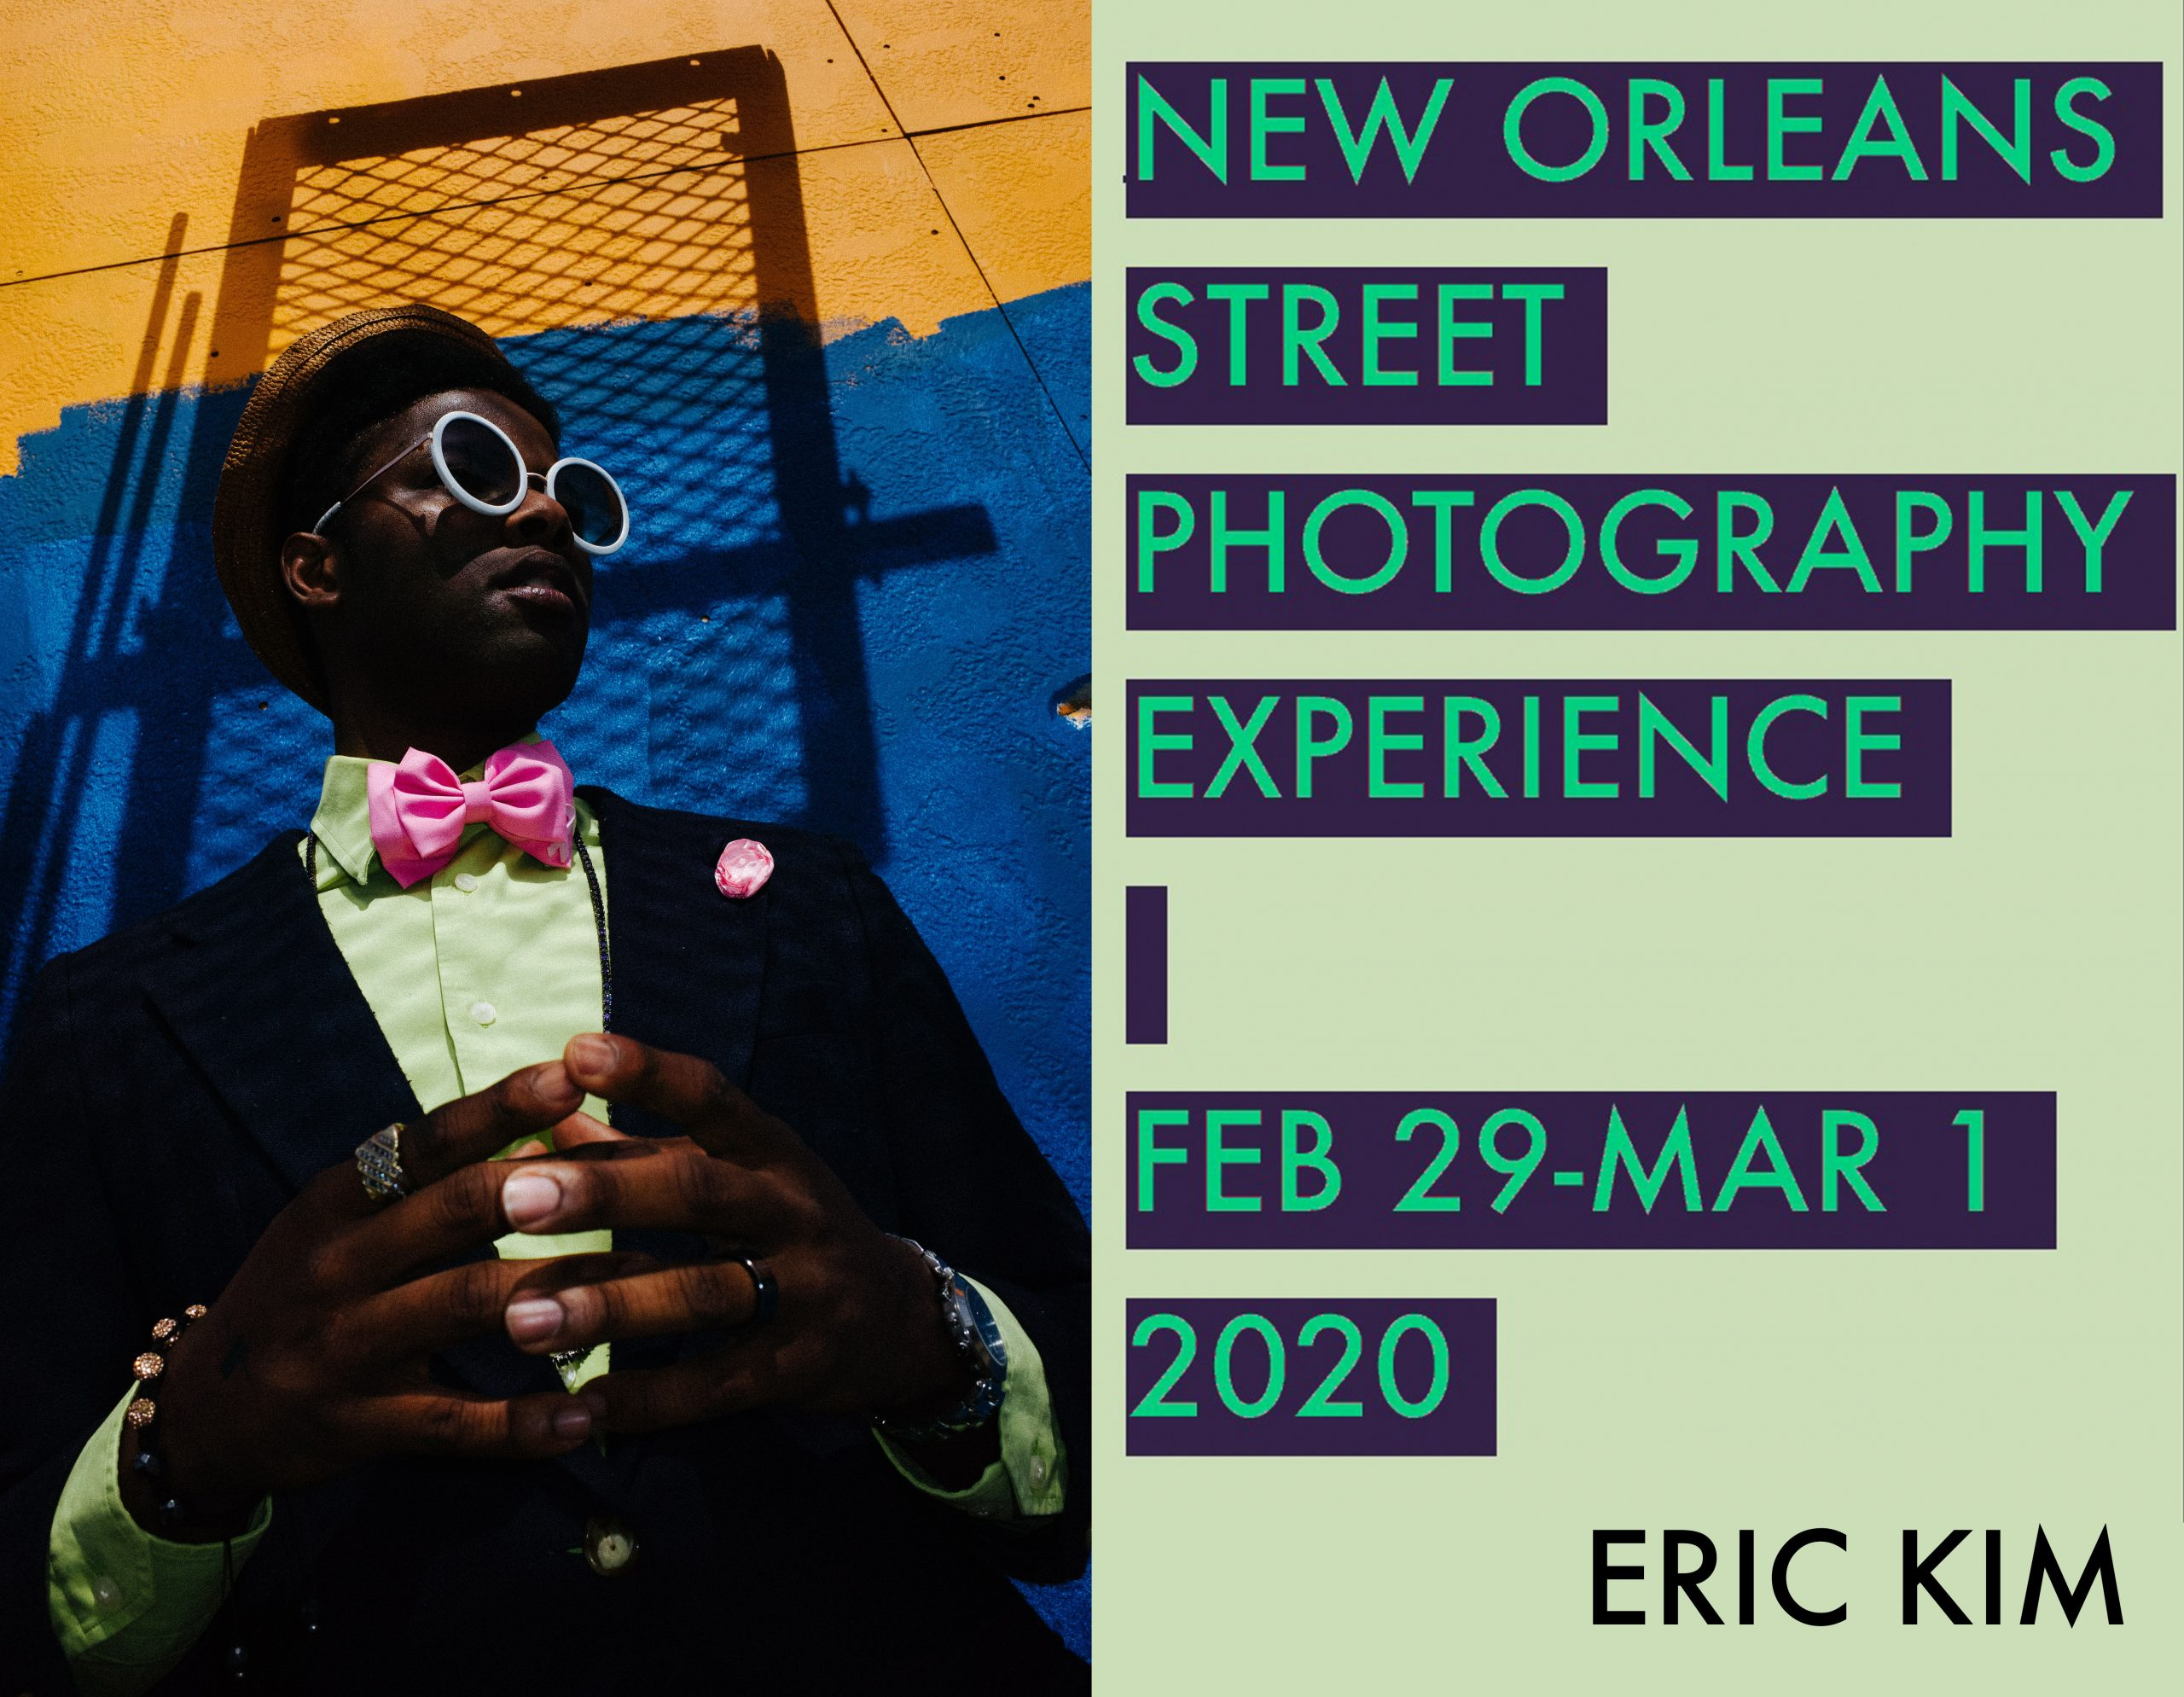 eric kim new orleans workshop 2020